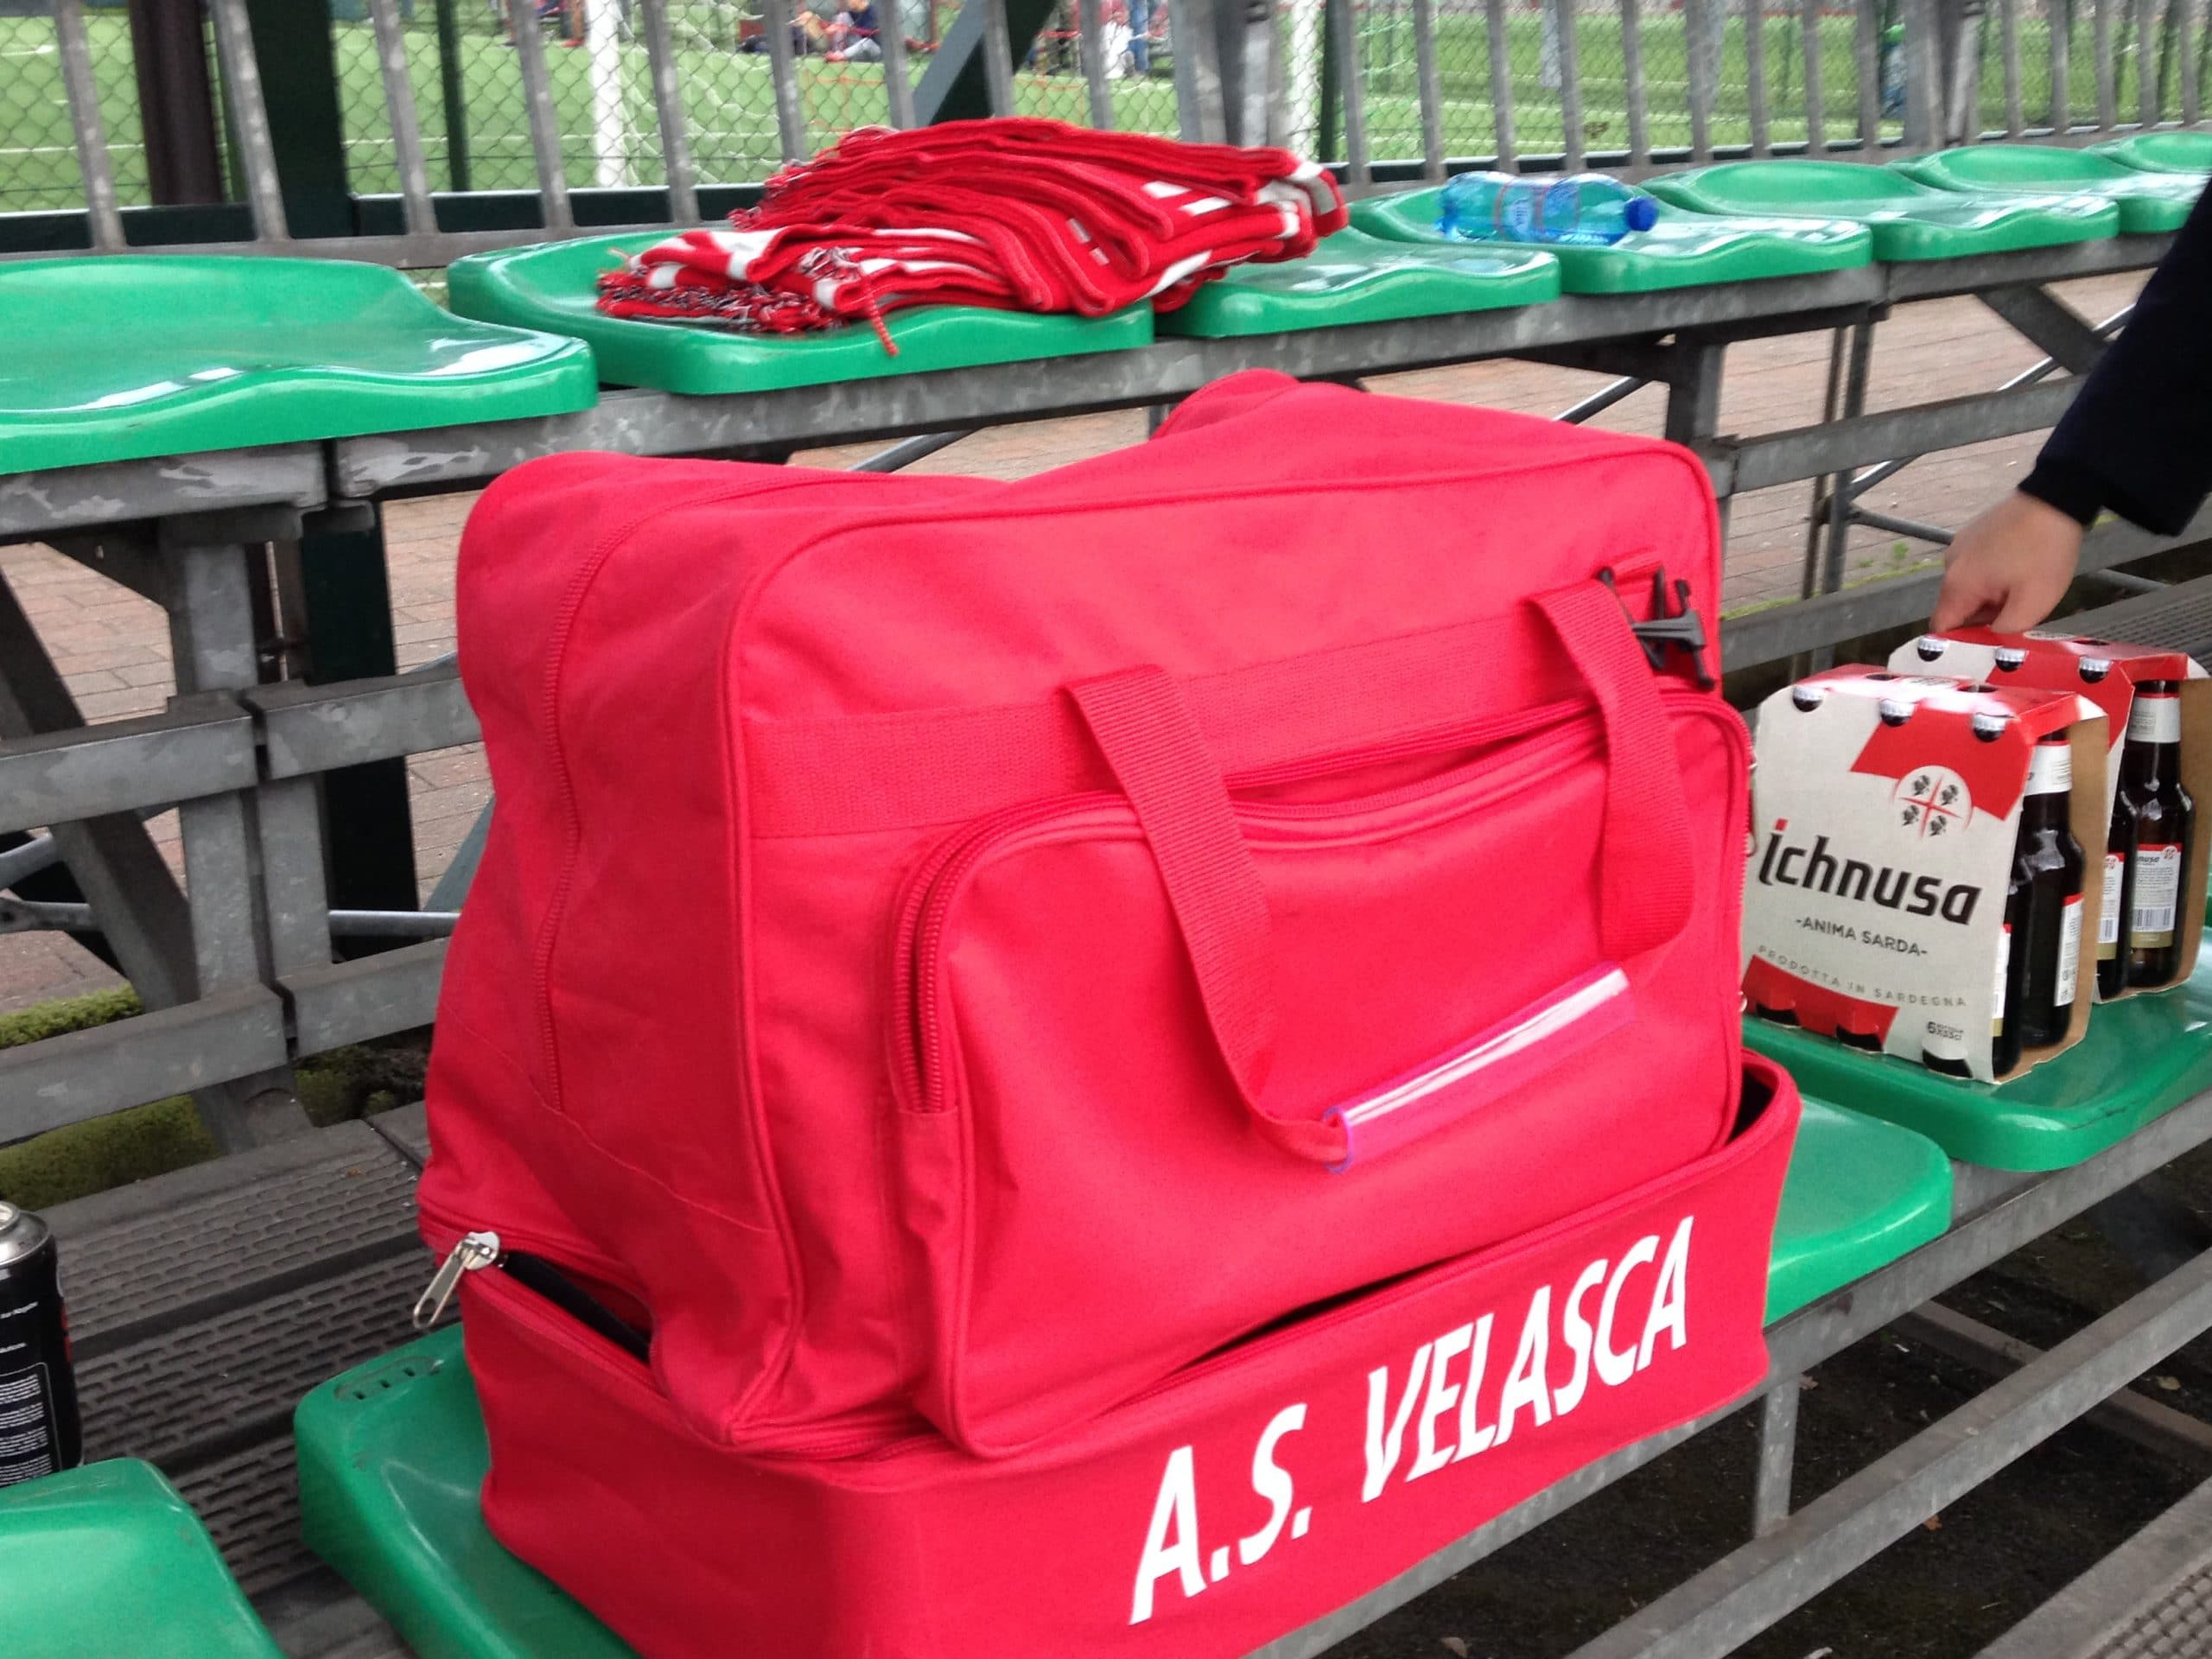 borsa ufficiale As Velasca